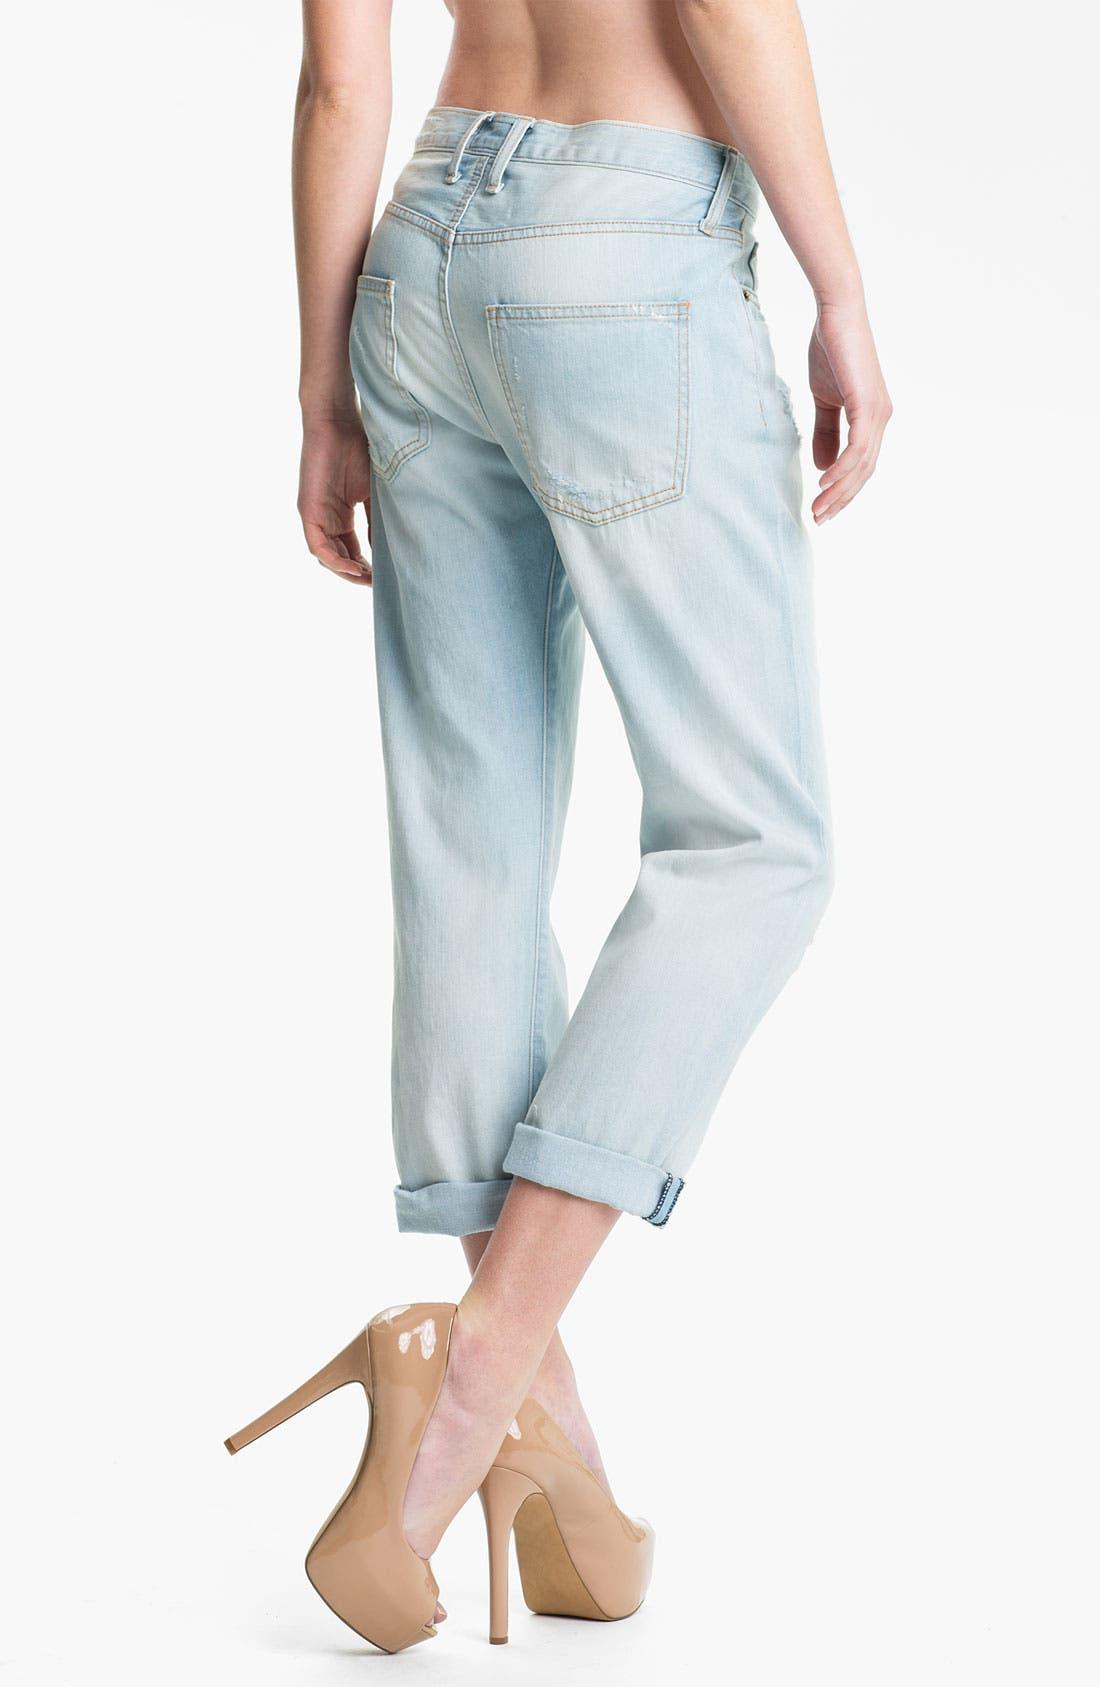 Alternate Image 2  - Current/Elliott 'The Boyfriend' Distressed Jeans (Parlor/Destroy)